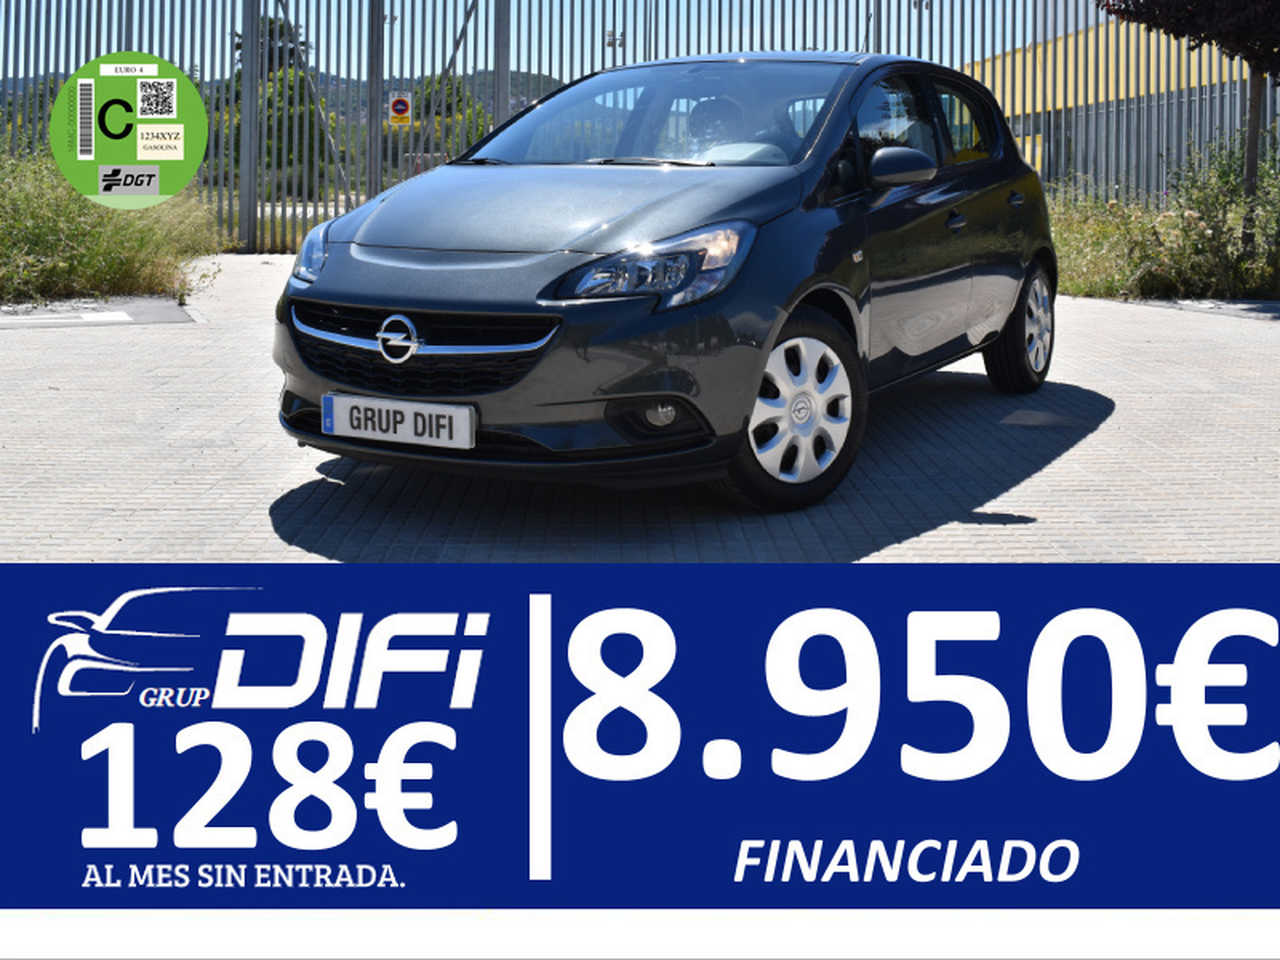 Opel Corsa 1.4 90cv 5p   - Foto 1